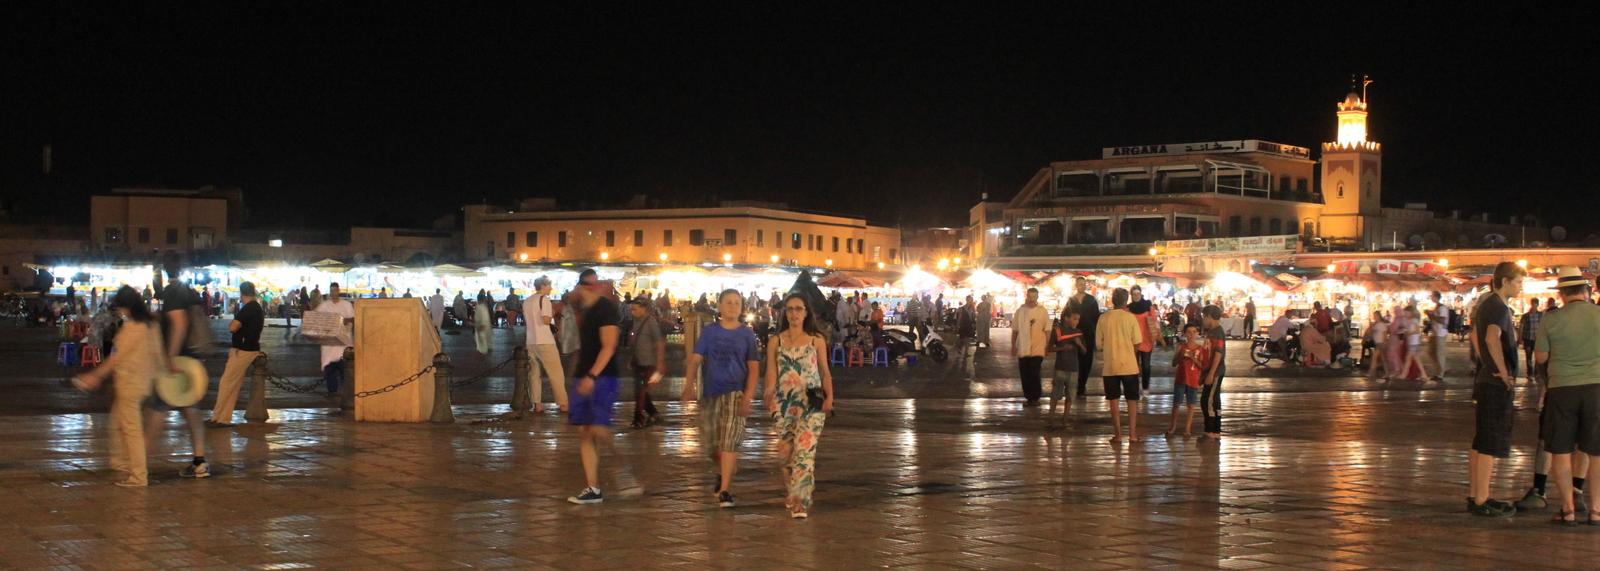 Jemma-el-Fna Square, Marrakech